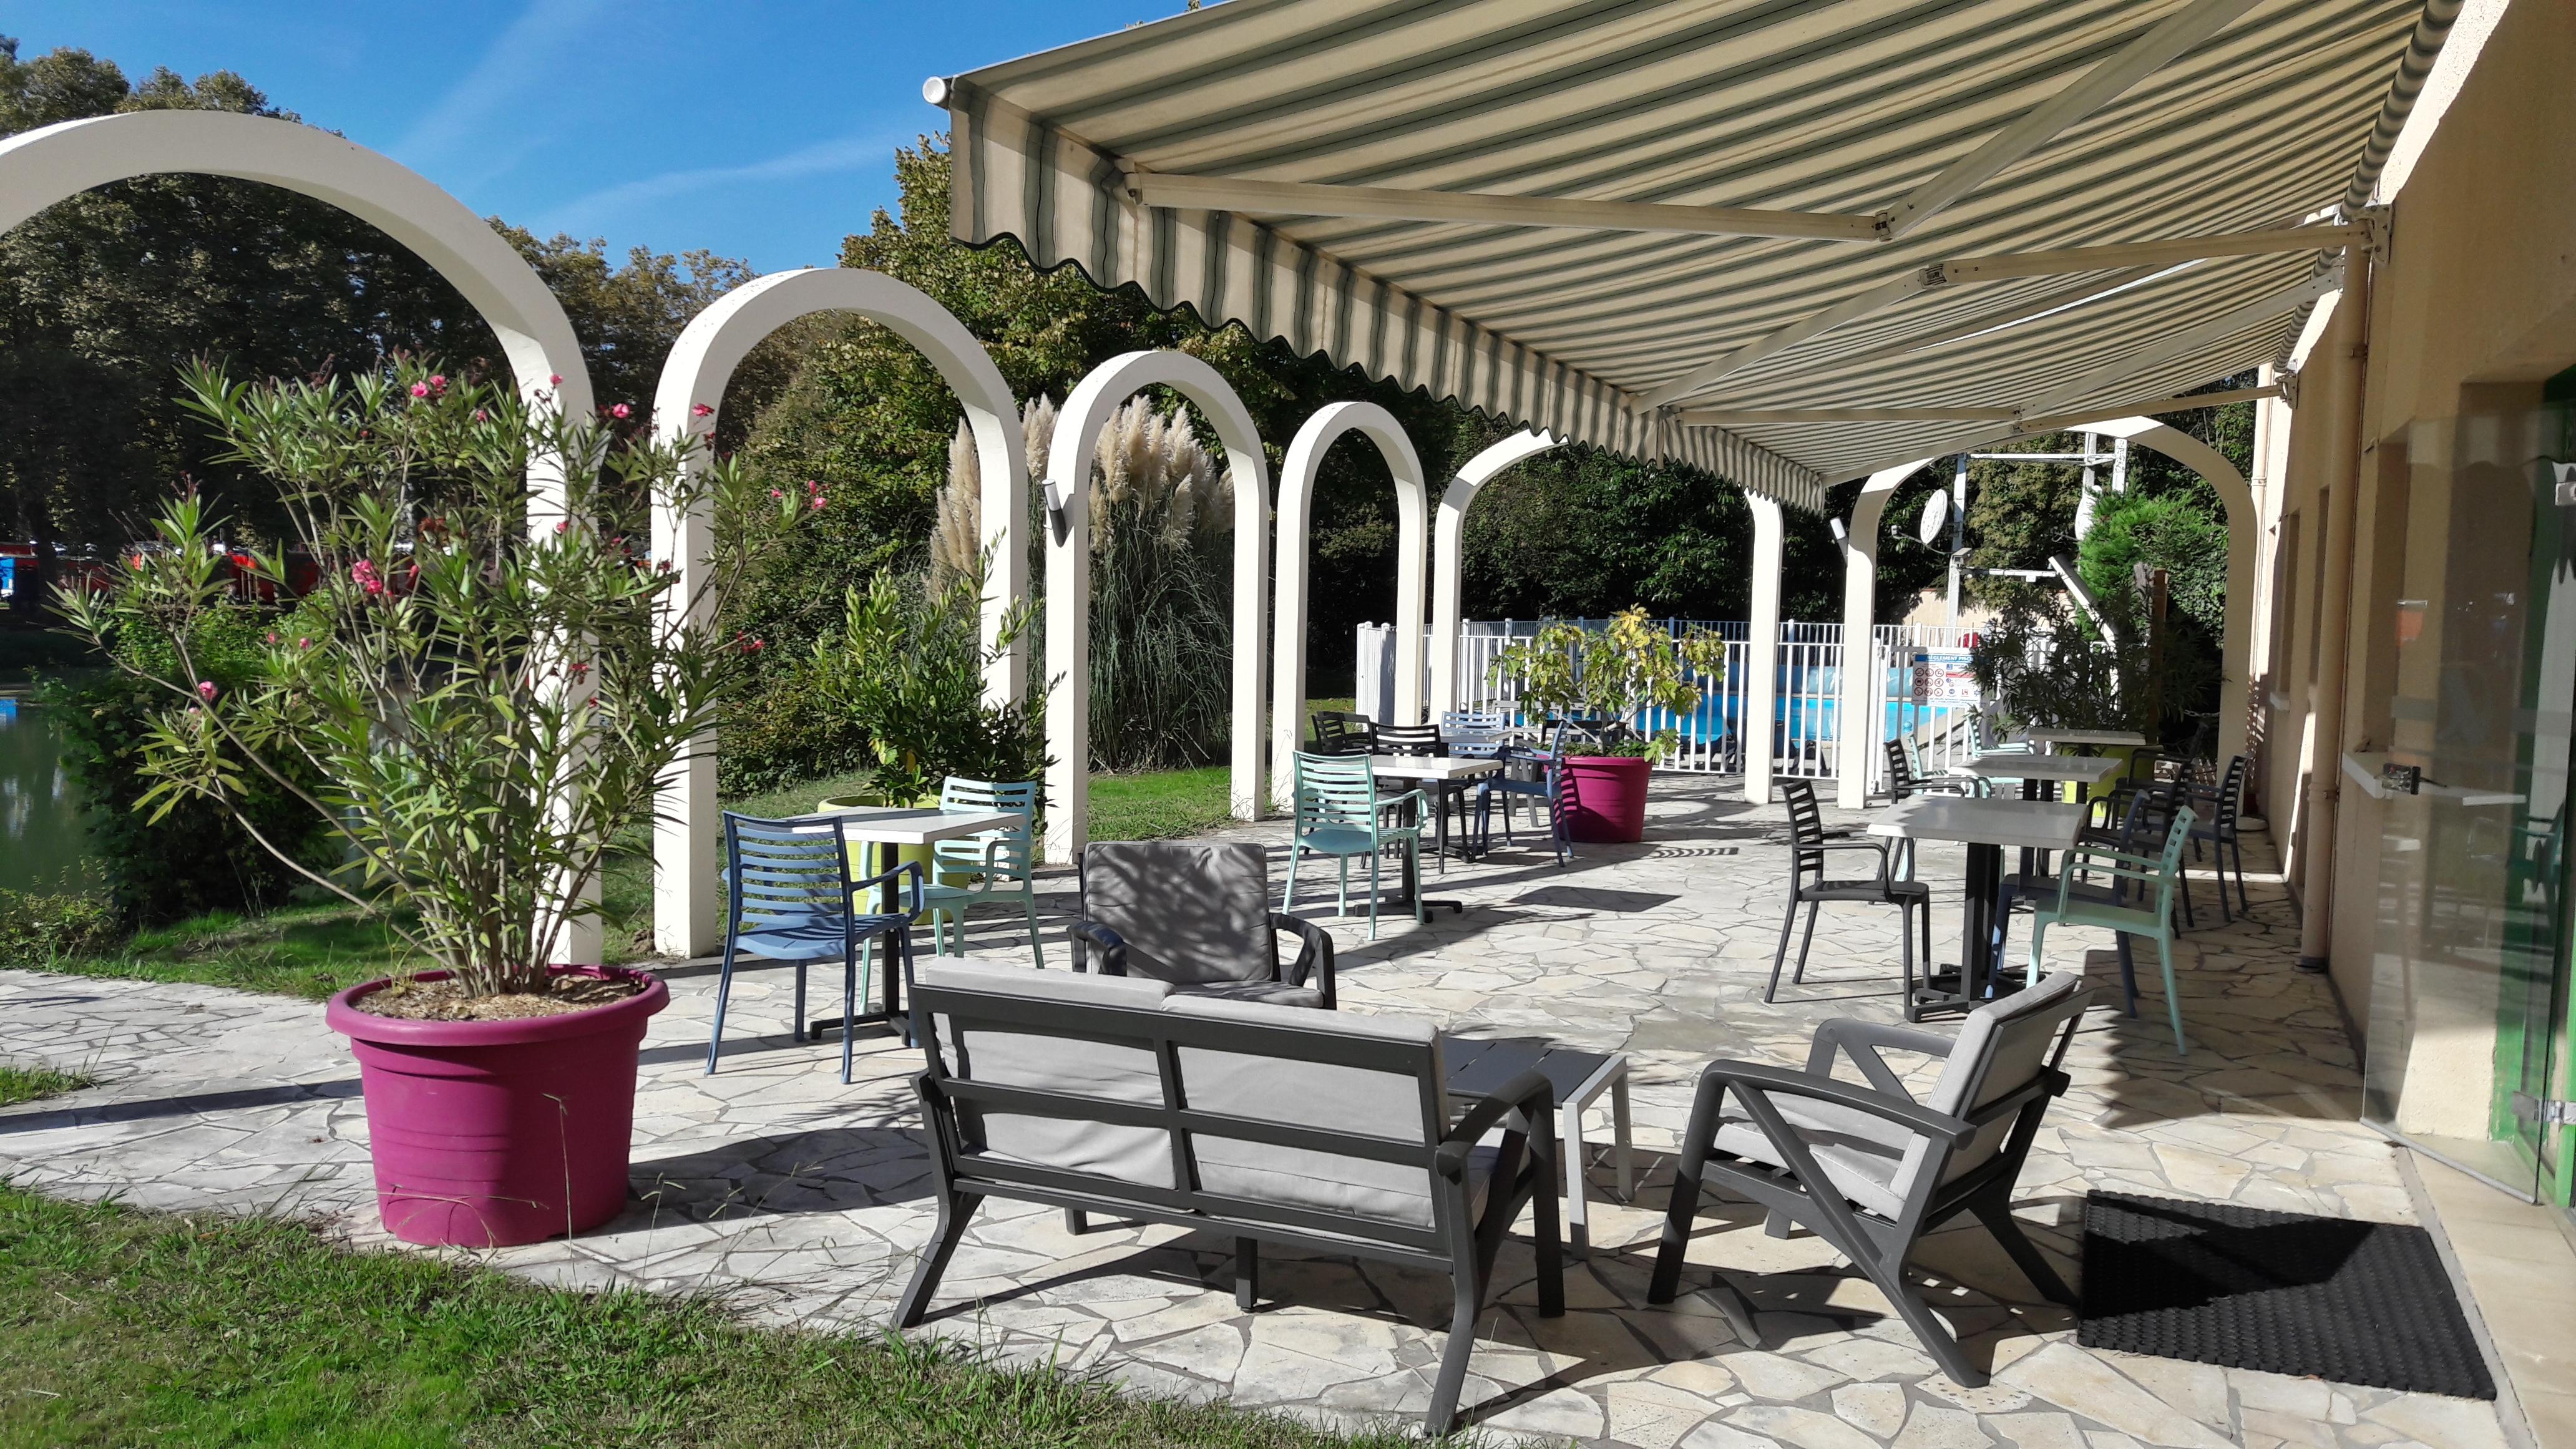 Terrasse et piscine au bord de l'Adour